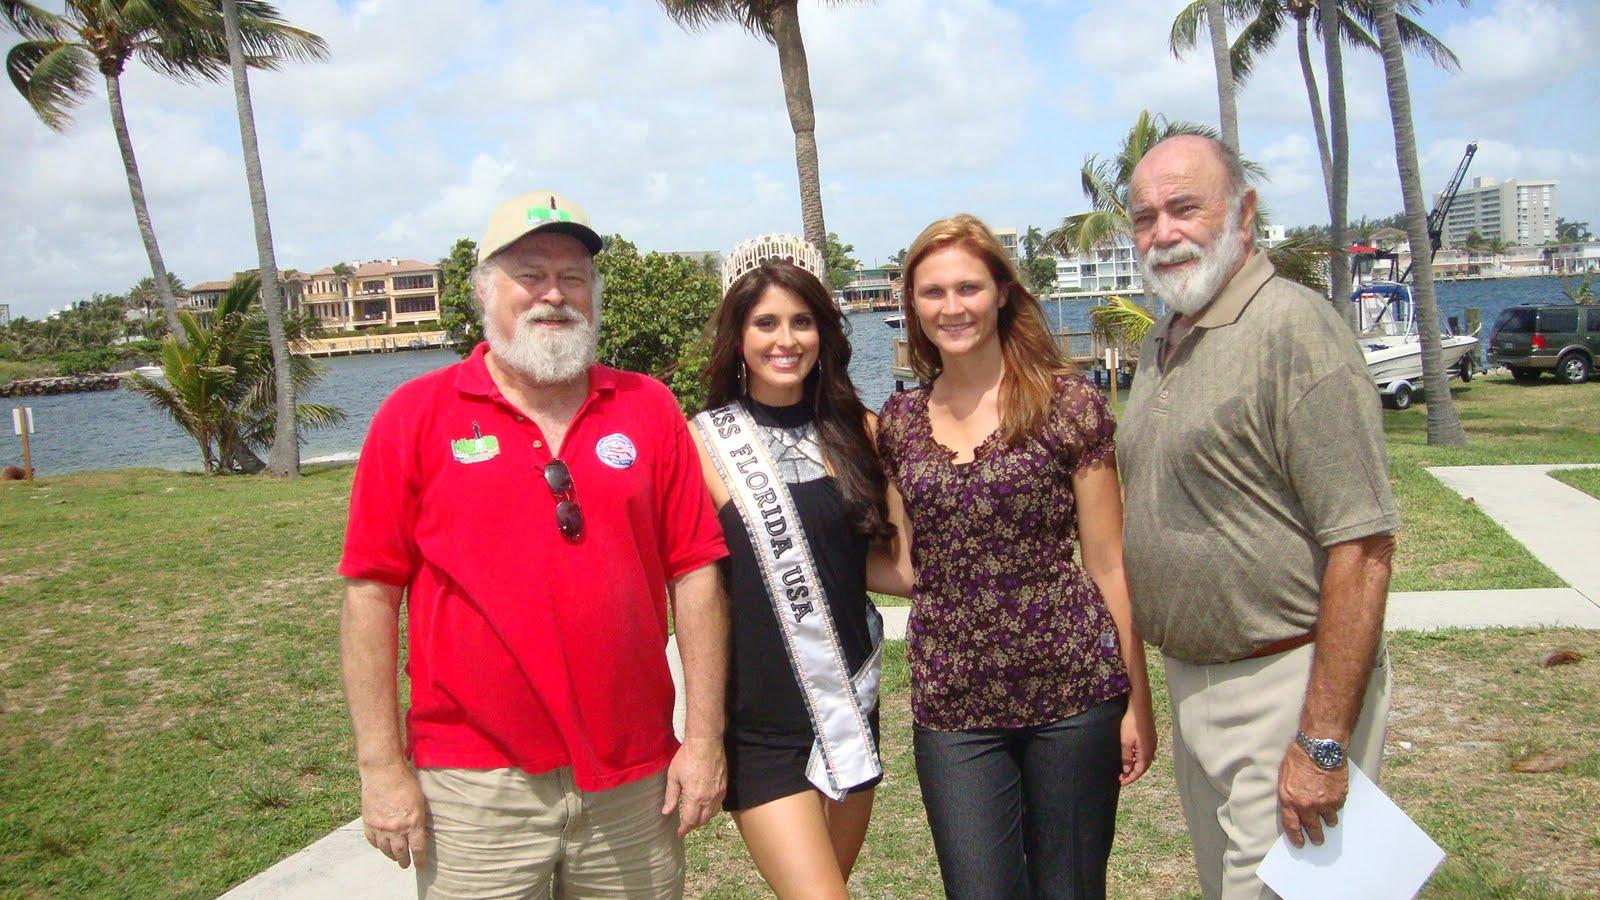 Miss Florida USA 2010 - Megan Clementi DSC01902